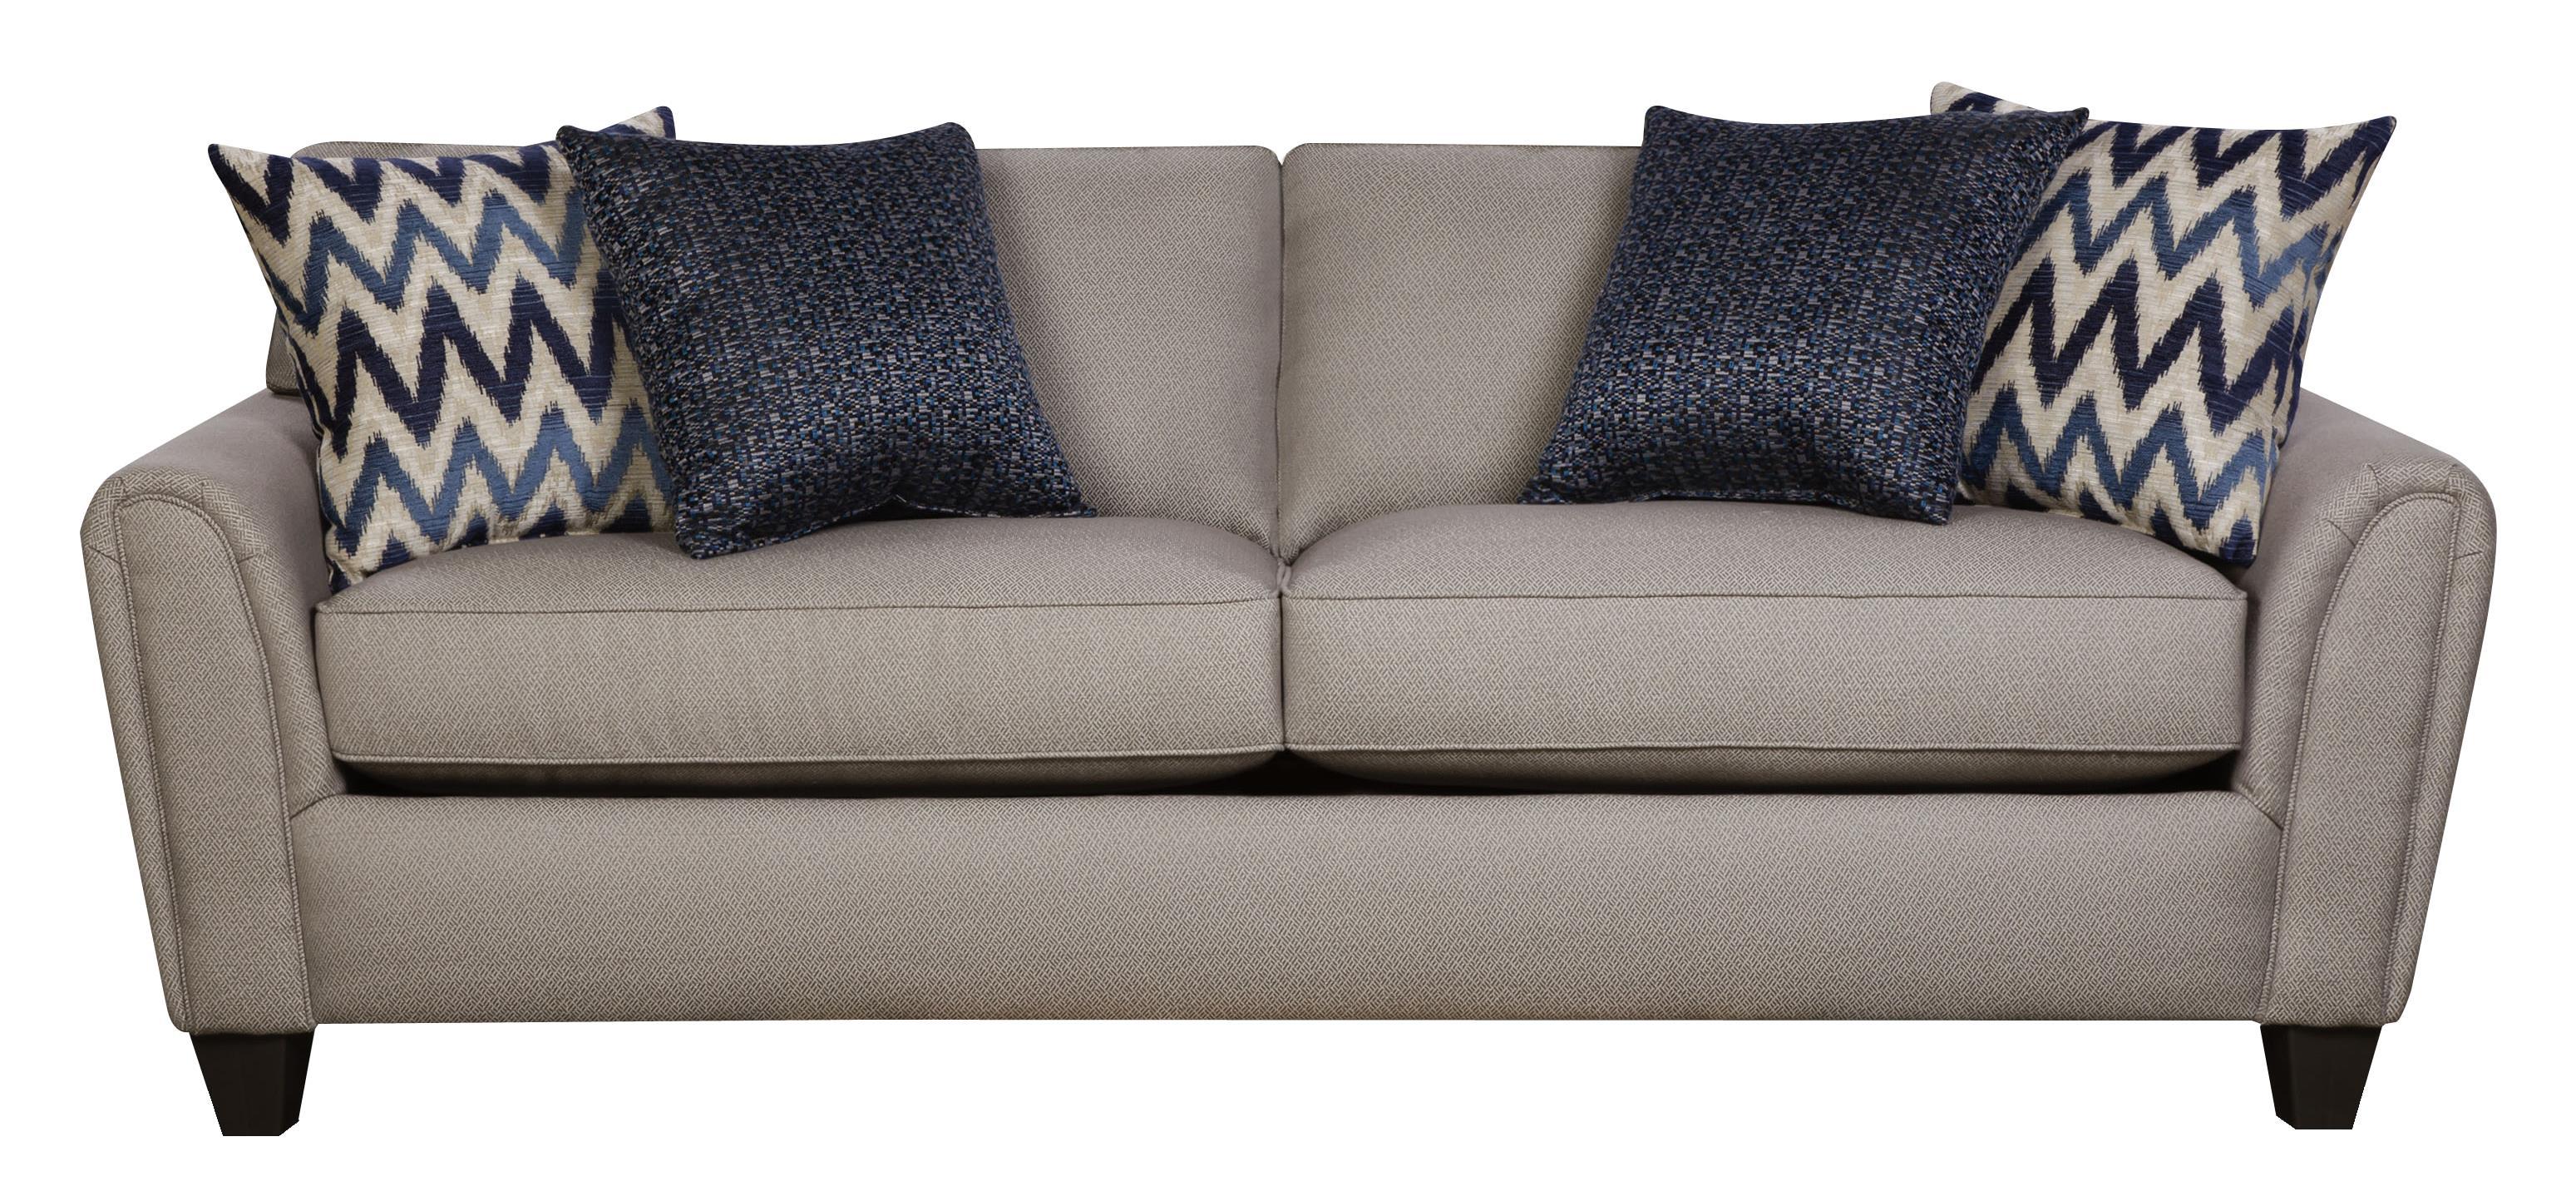 Corinthian 55A0 Sofa - Item Number: 55A3-Goldmine-Slate